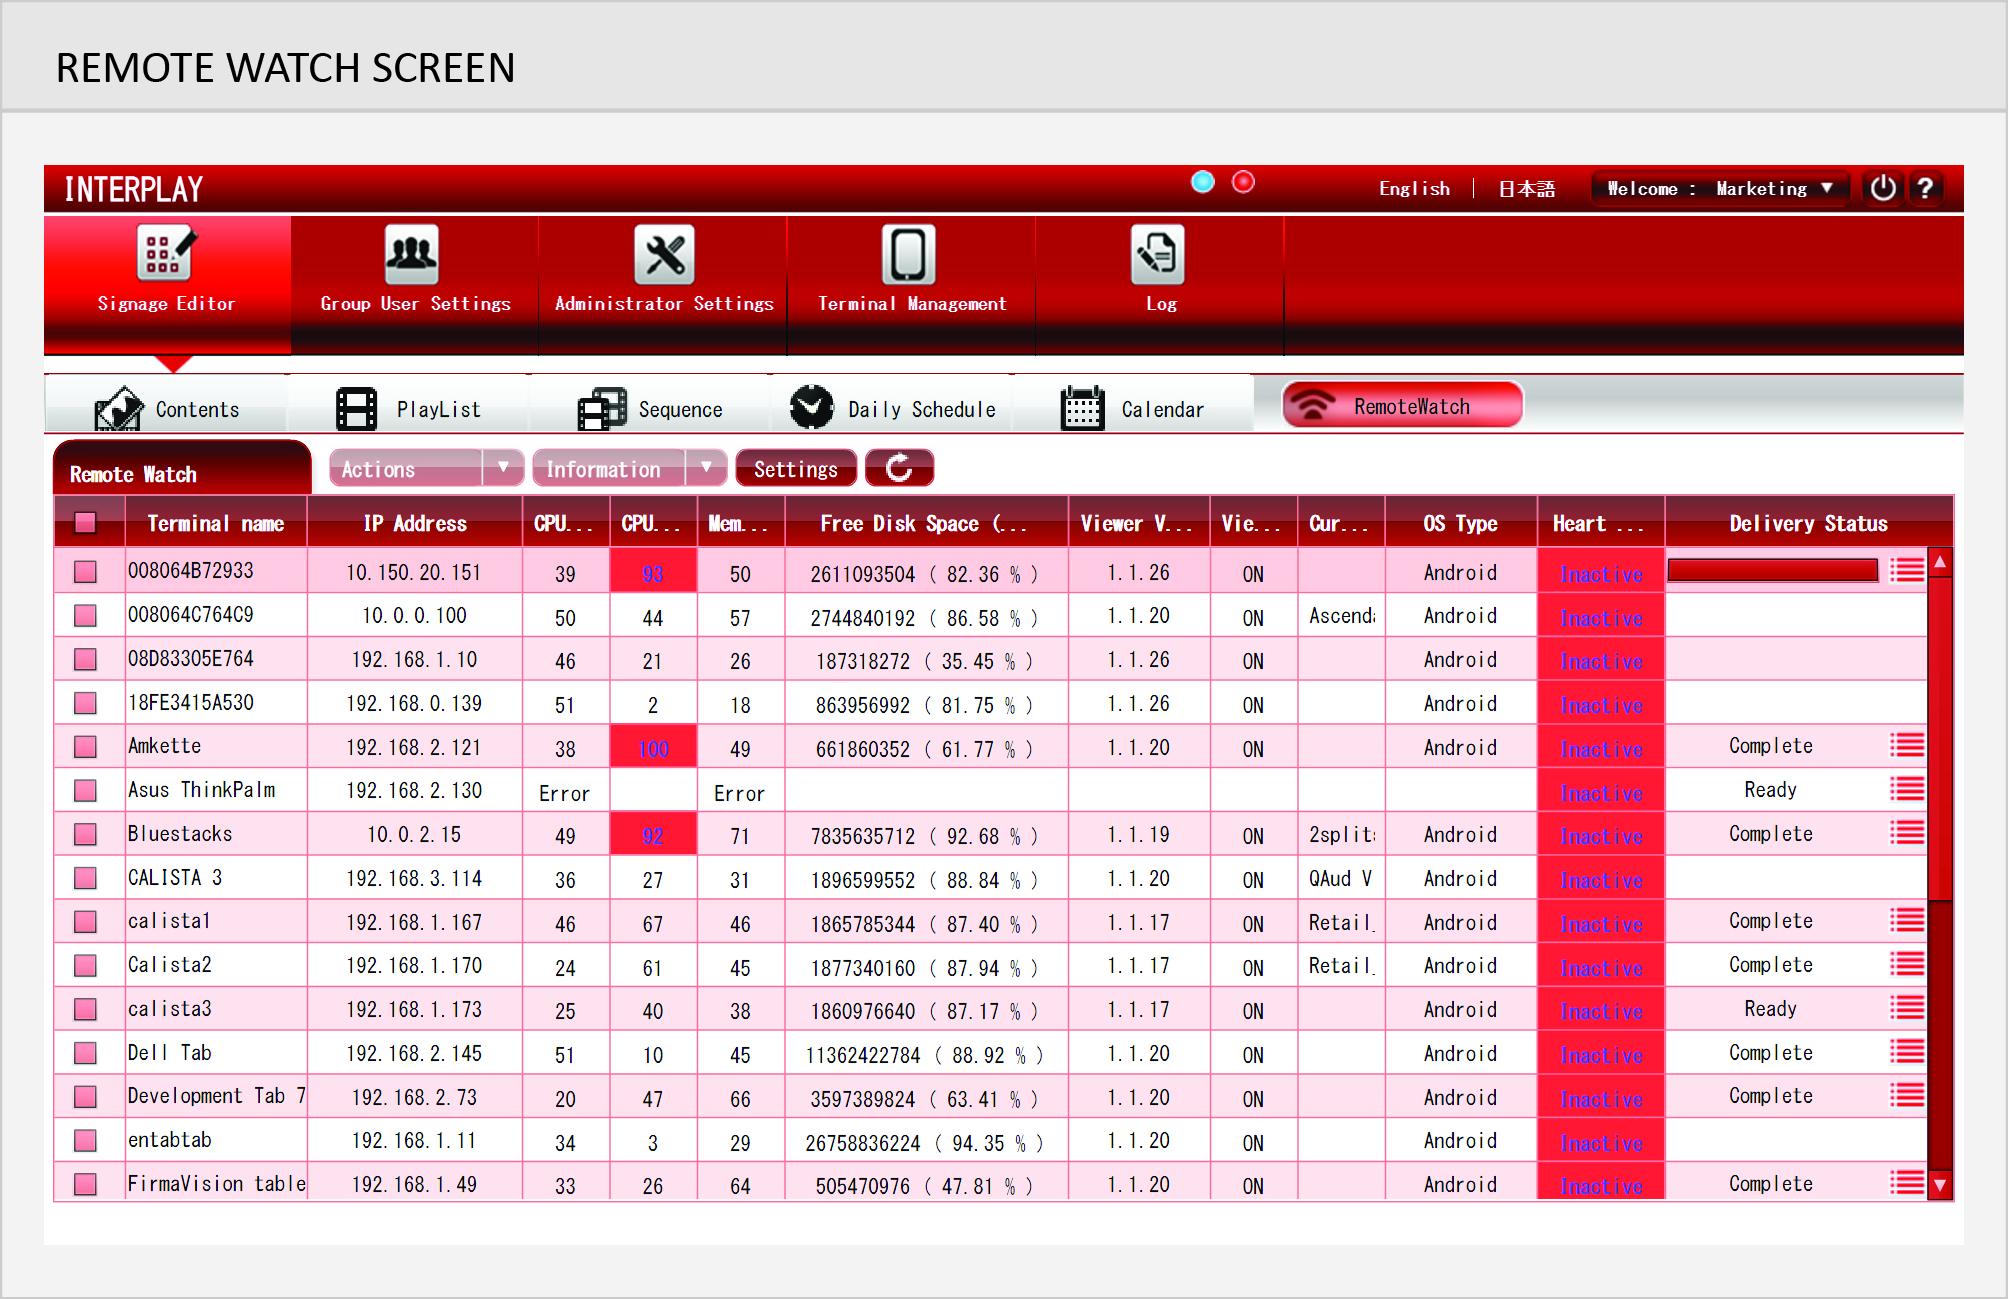 Remote Watch Screen